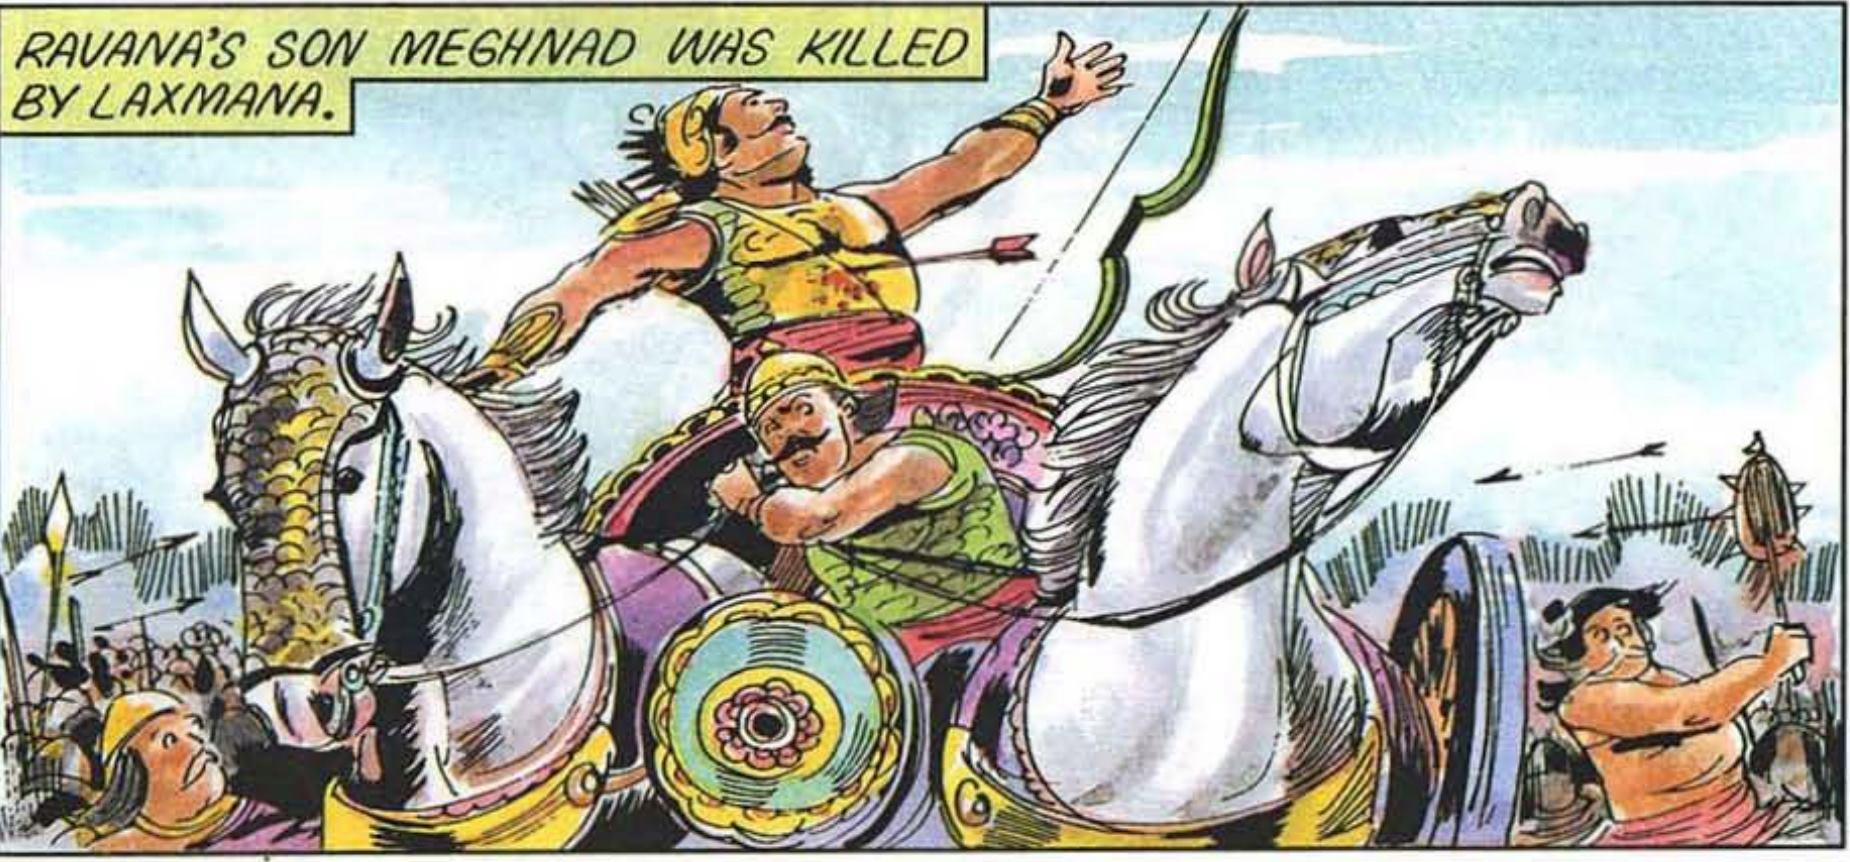 Reference of Lakshmana killing Meghnad- Courtesy Amar Chitra Katha